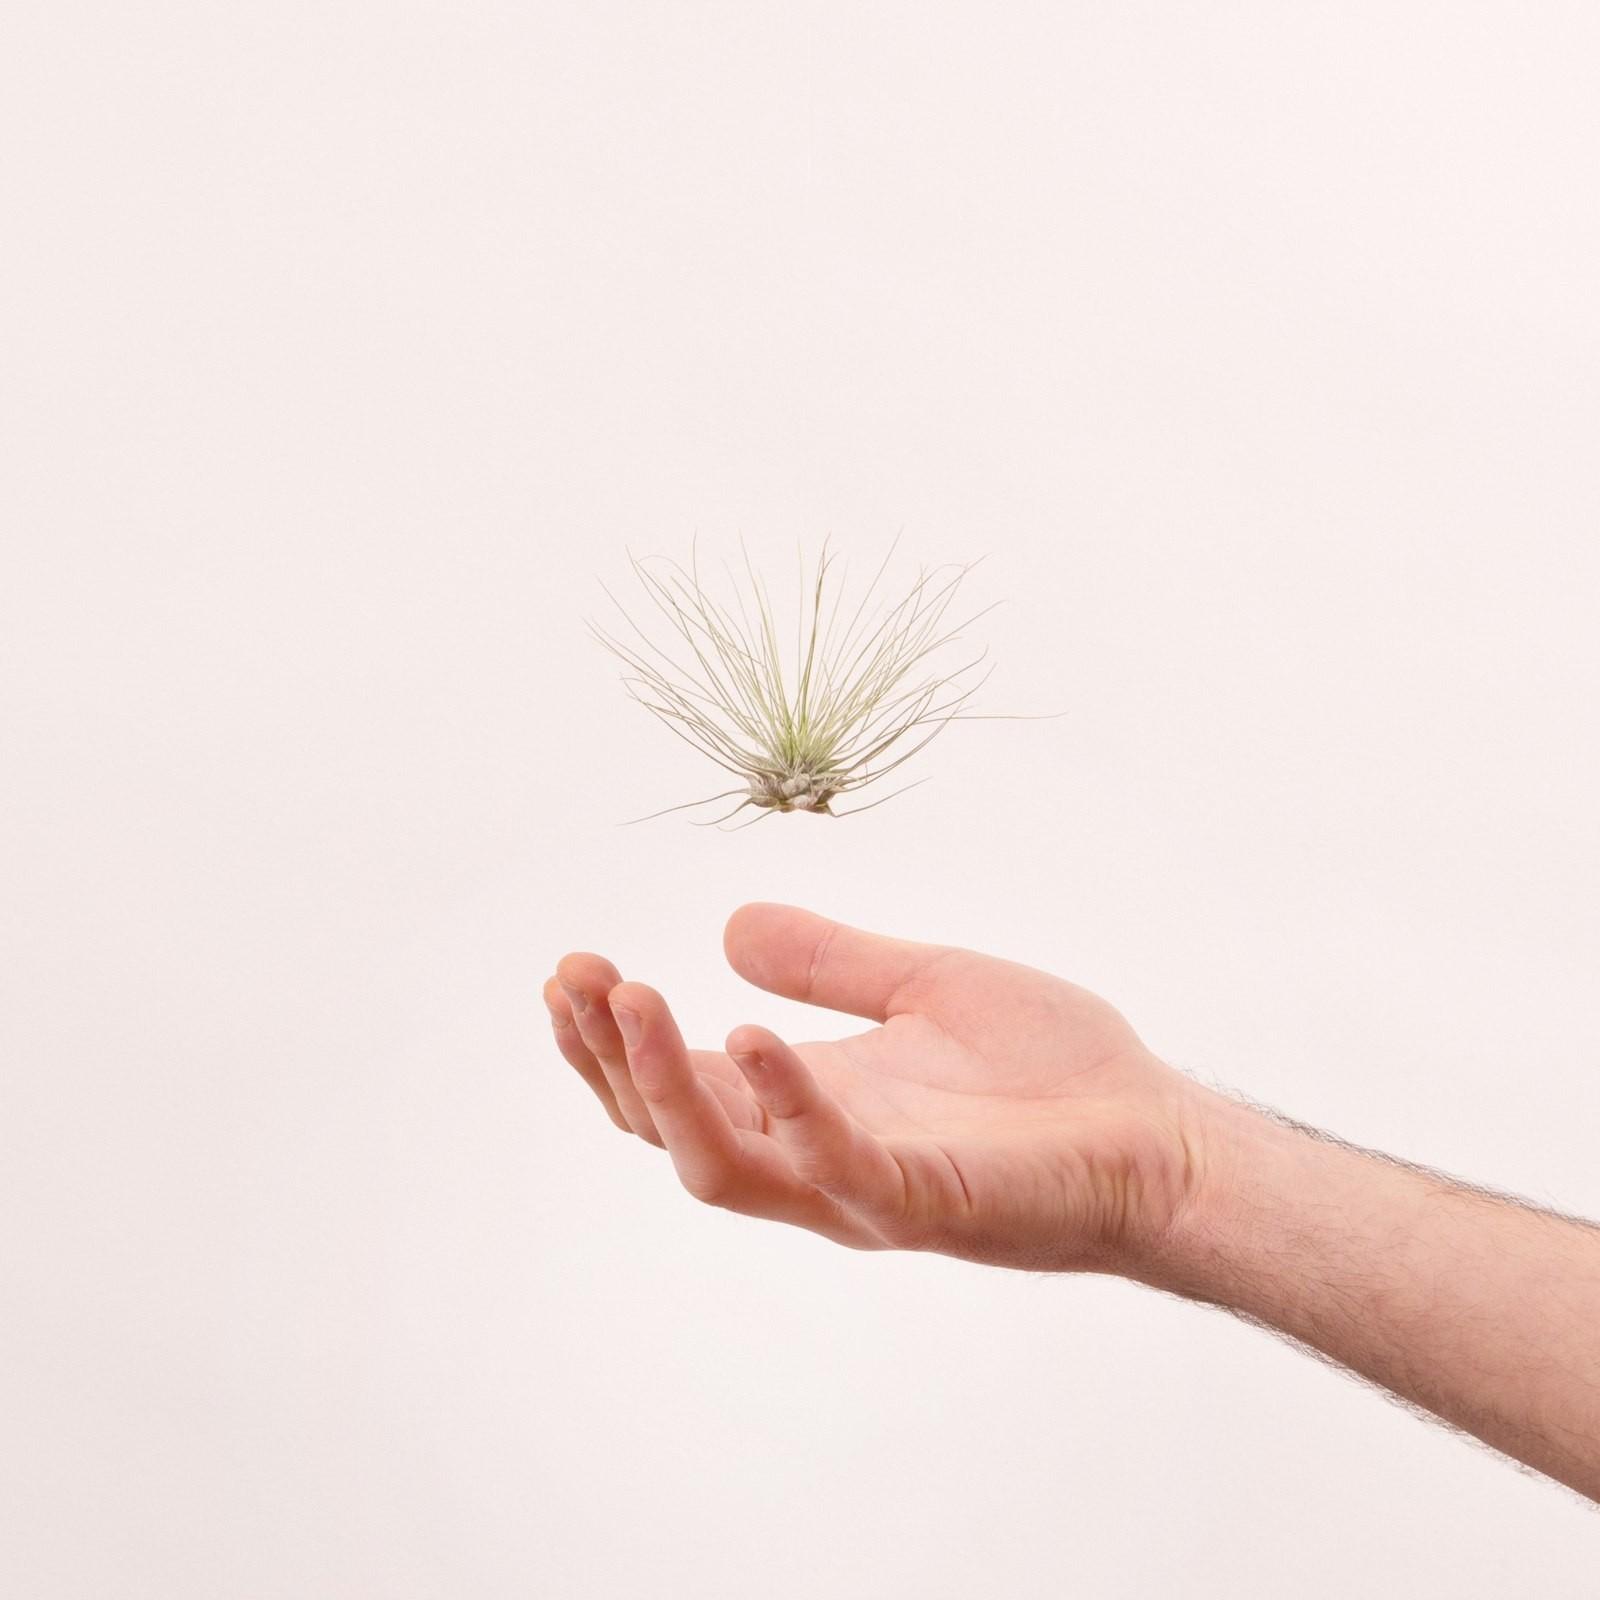 argentea tillandsia luftpflanze mit feinen silbernen bl ttern. Black Bedroom Furniture Sets. Home Design Ideas